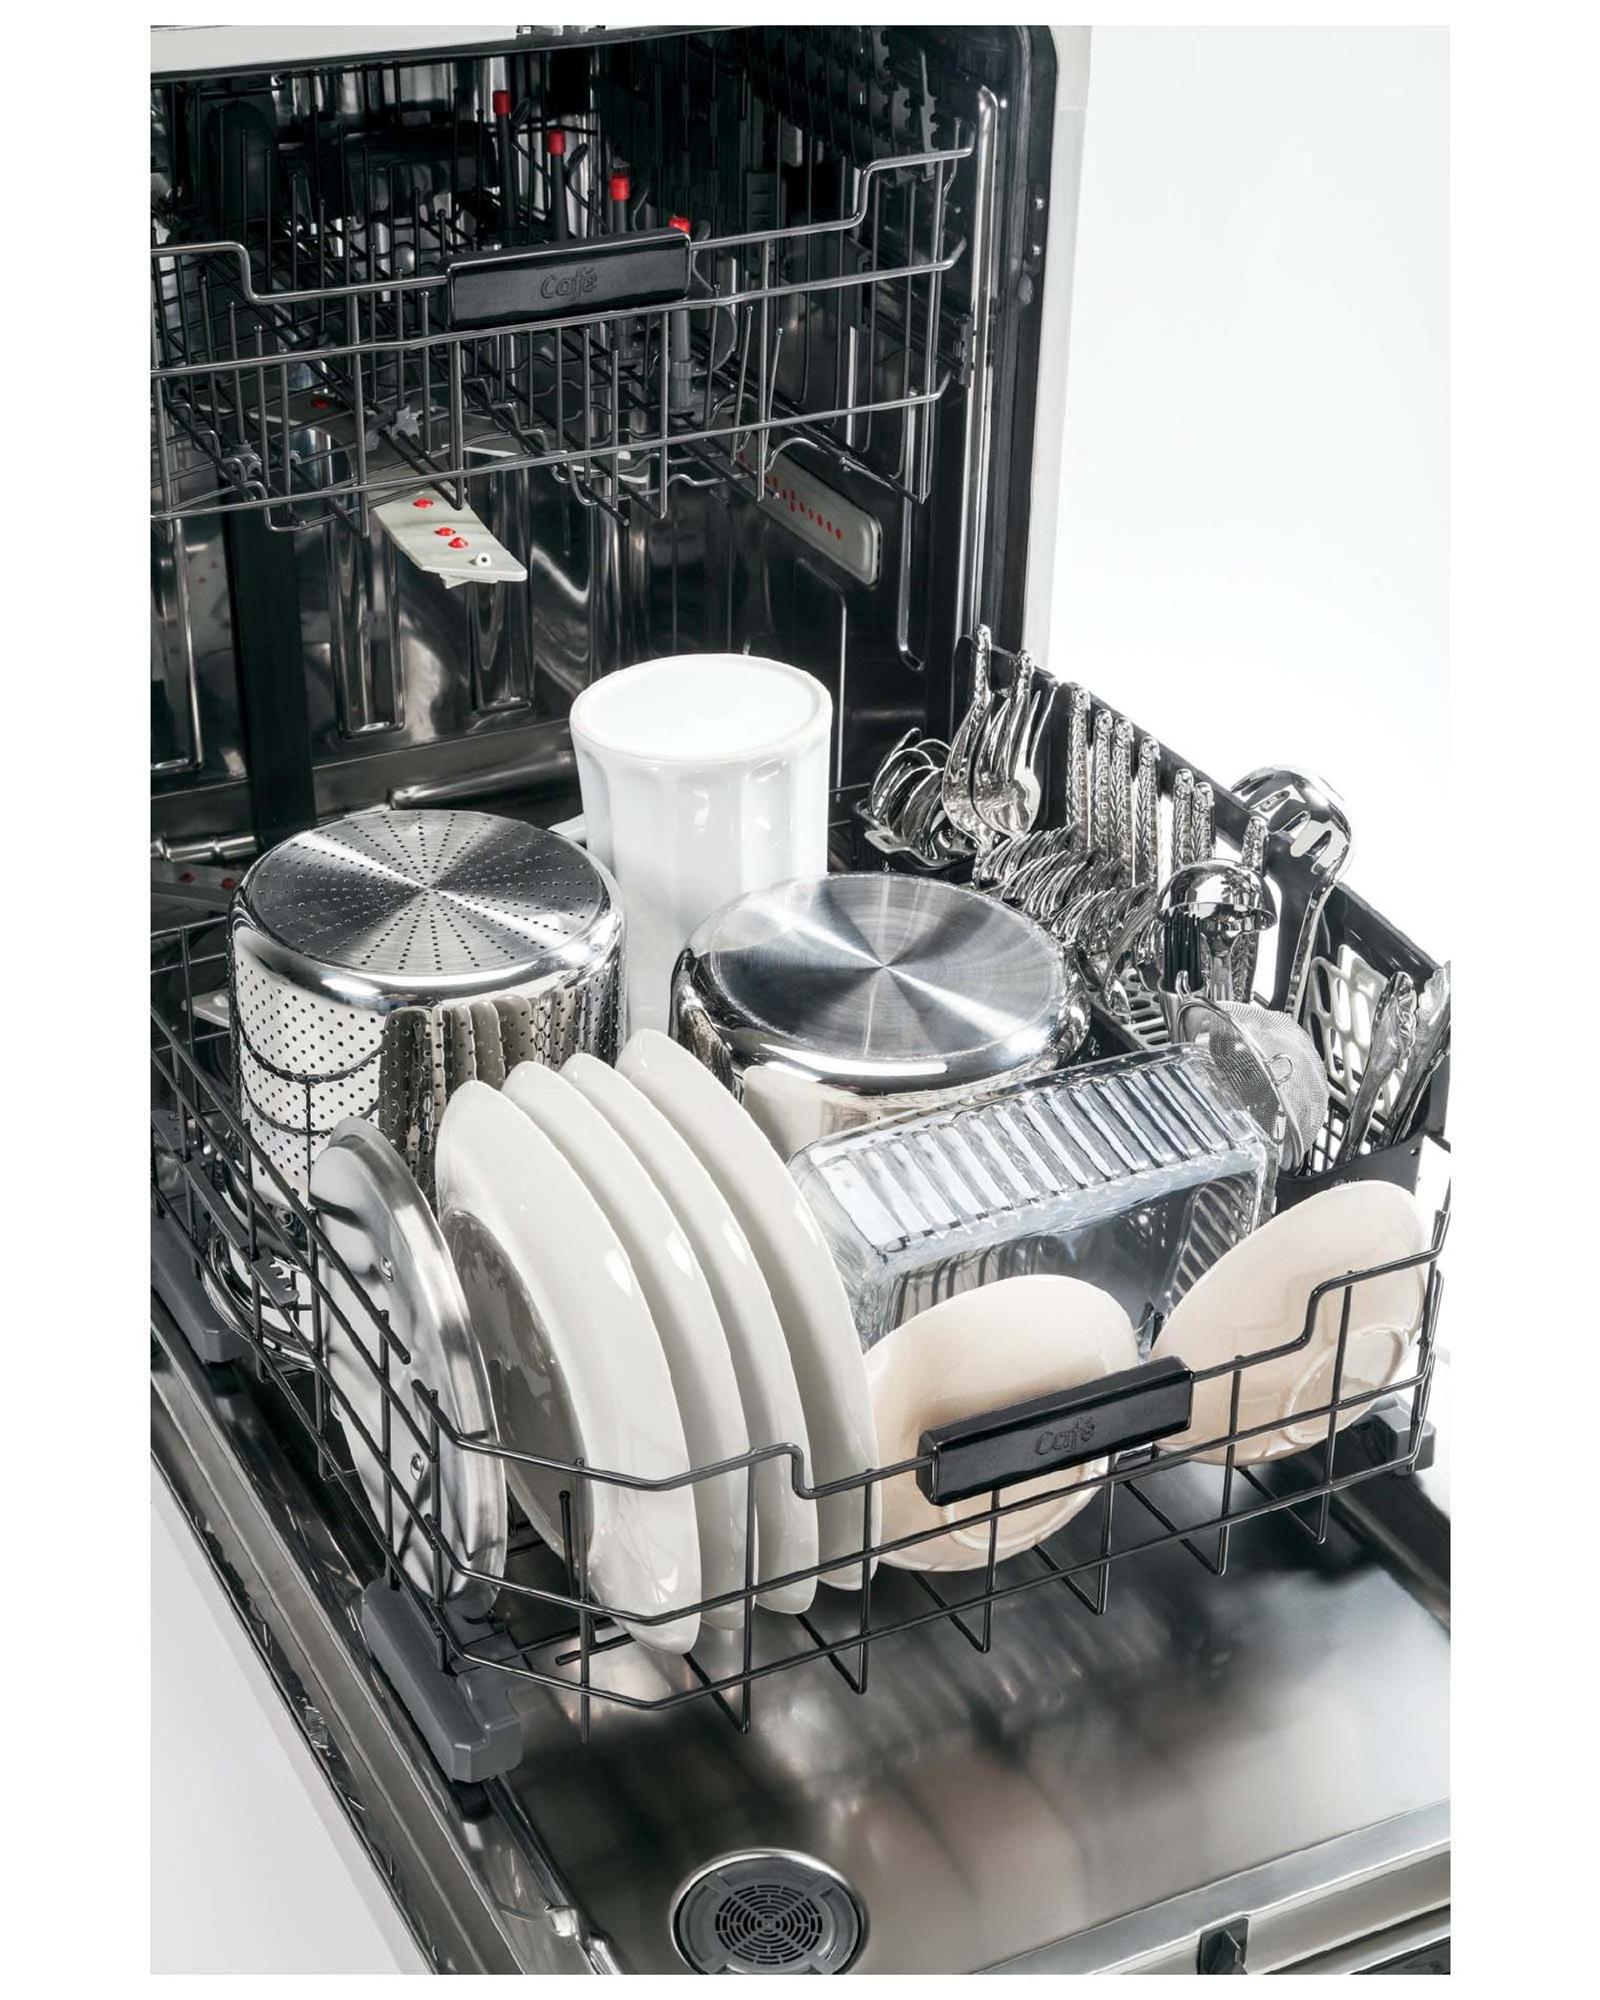 "GE Cafe™ Series CDT725SSFSS 24"" Built-in Dishwasher w/ Stainless Steel Interior - Stainless Steel"